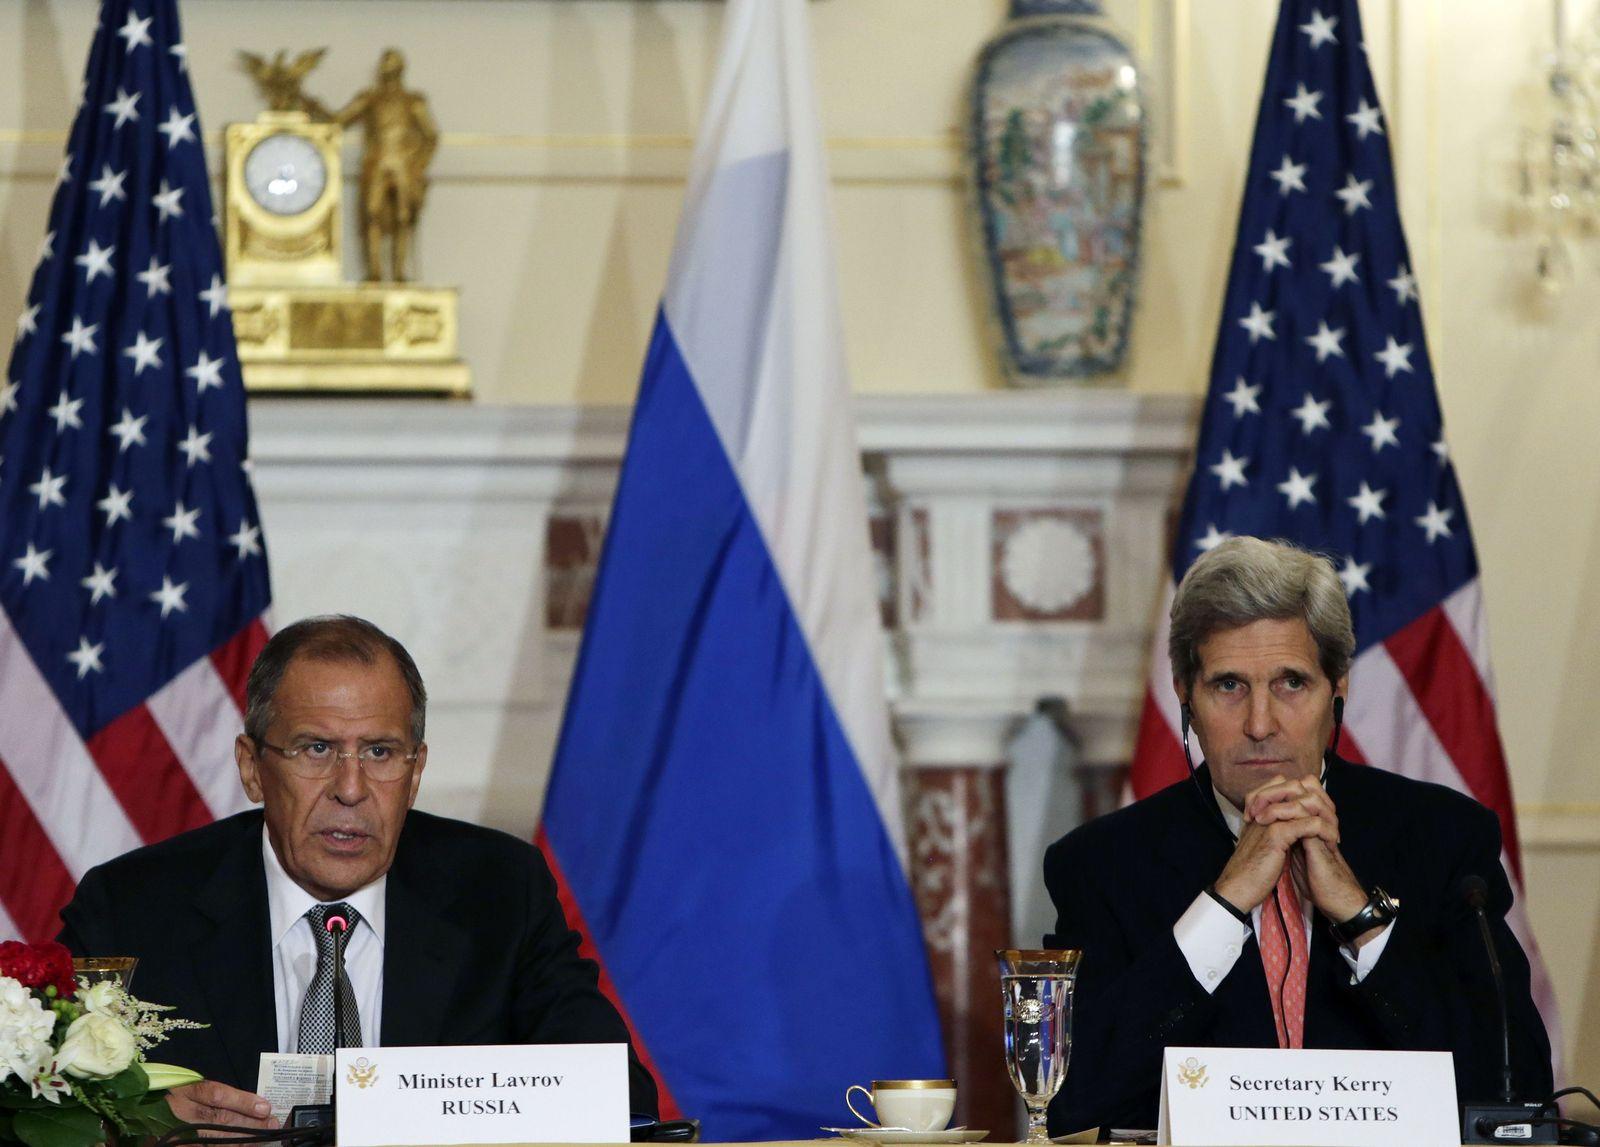 USA-RUSSIA/ Lawrow und Kerry